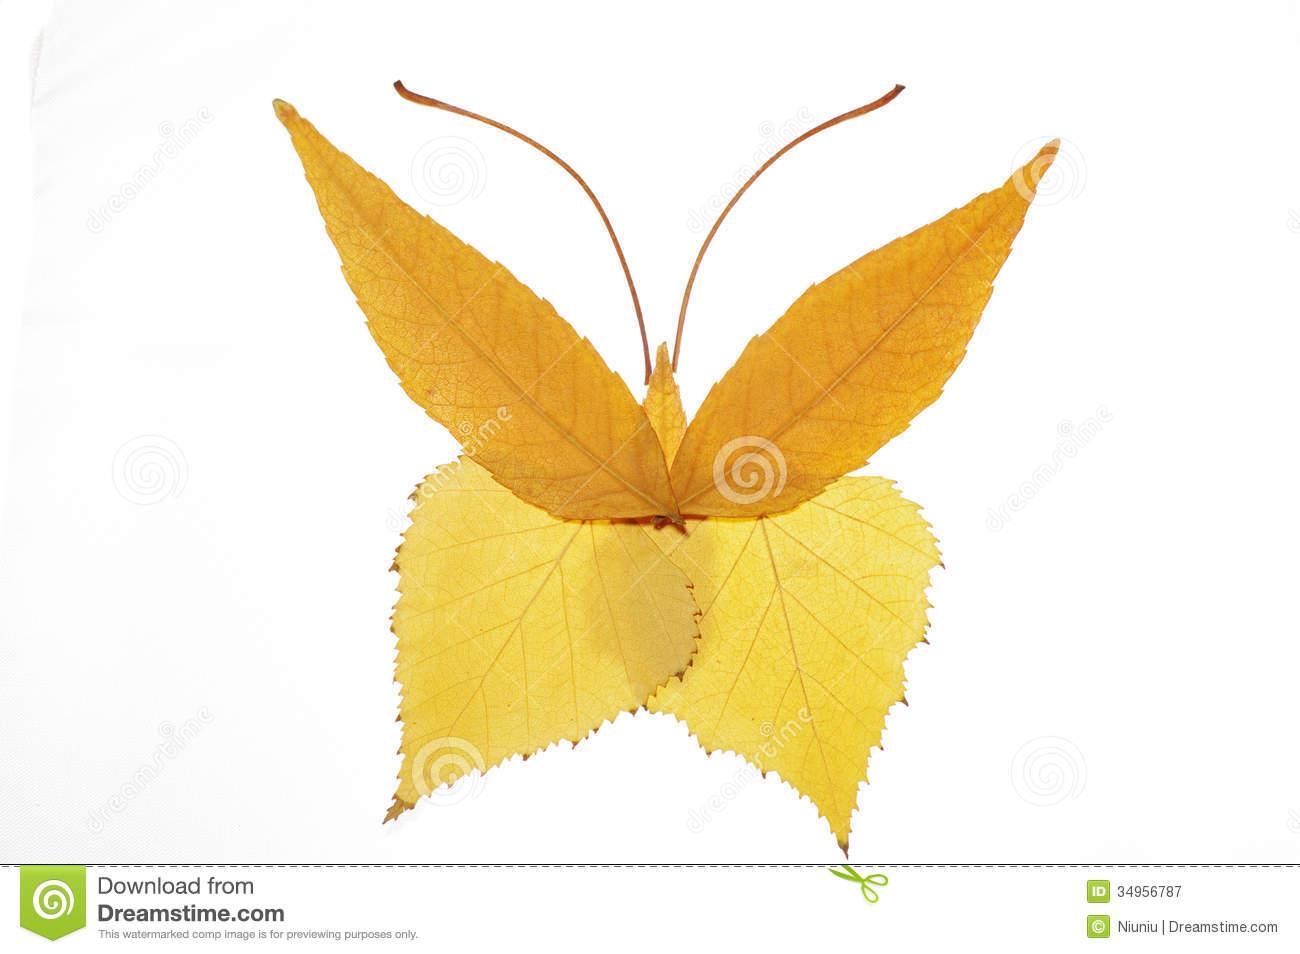 collage-painting-leaves-butterfly-leavesinteresting-34956787.jpg